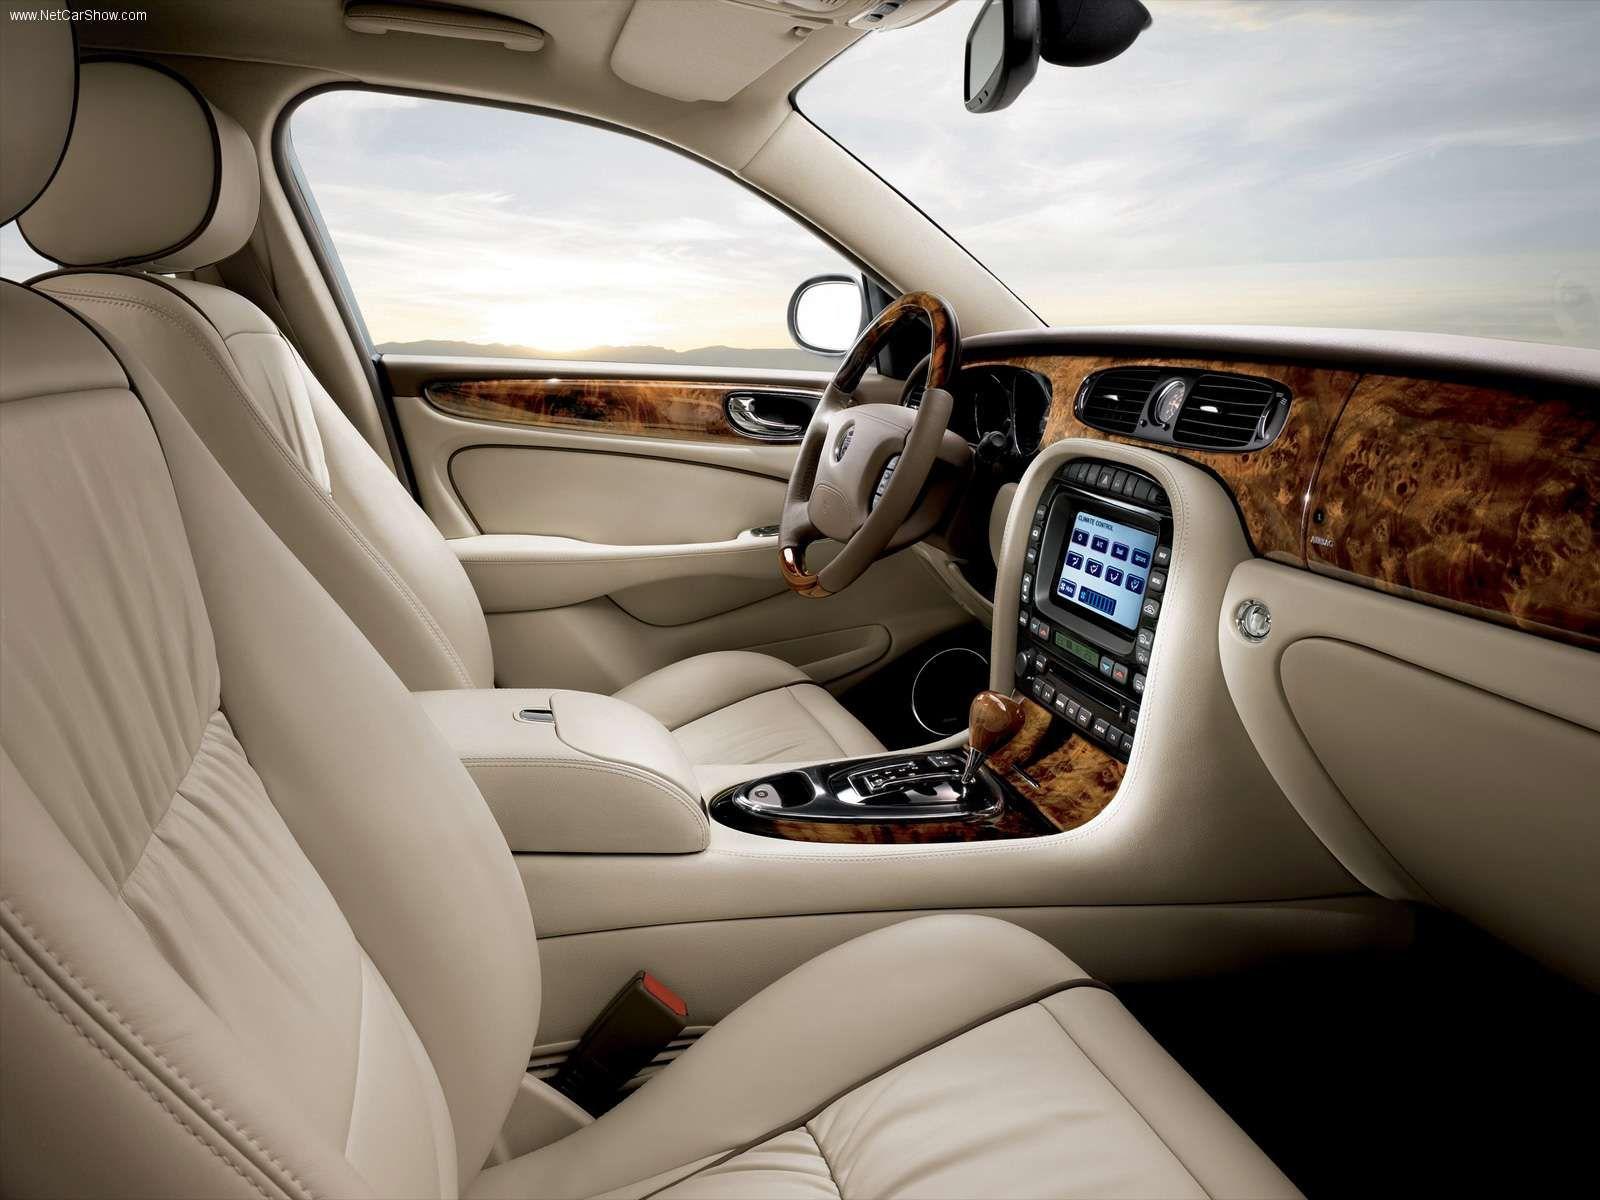 Classy Interior Of The Jaguar Xj Sweet Rides Pinterest